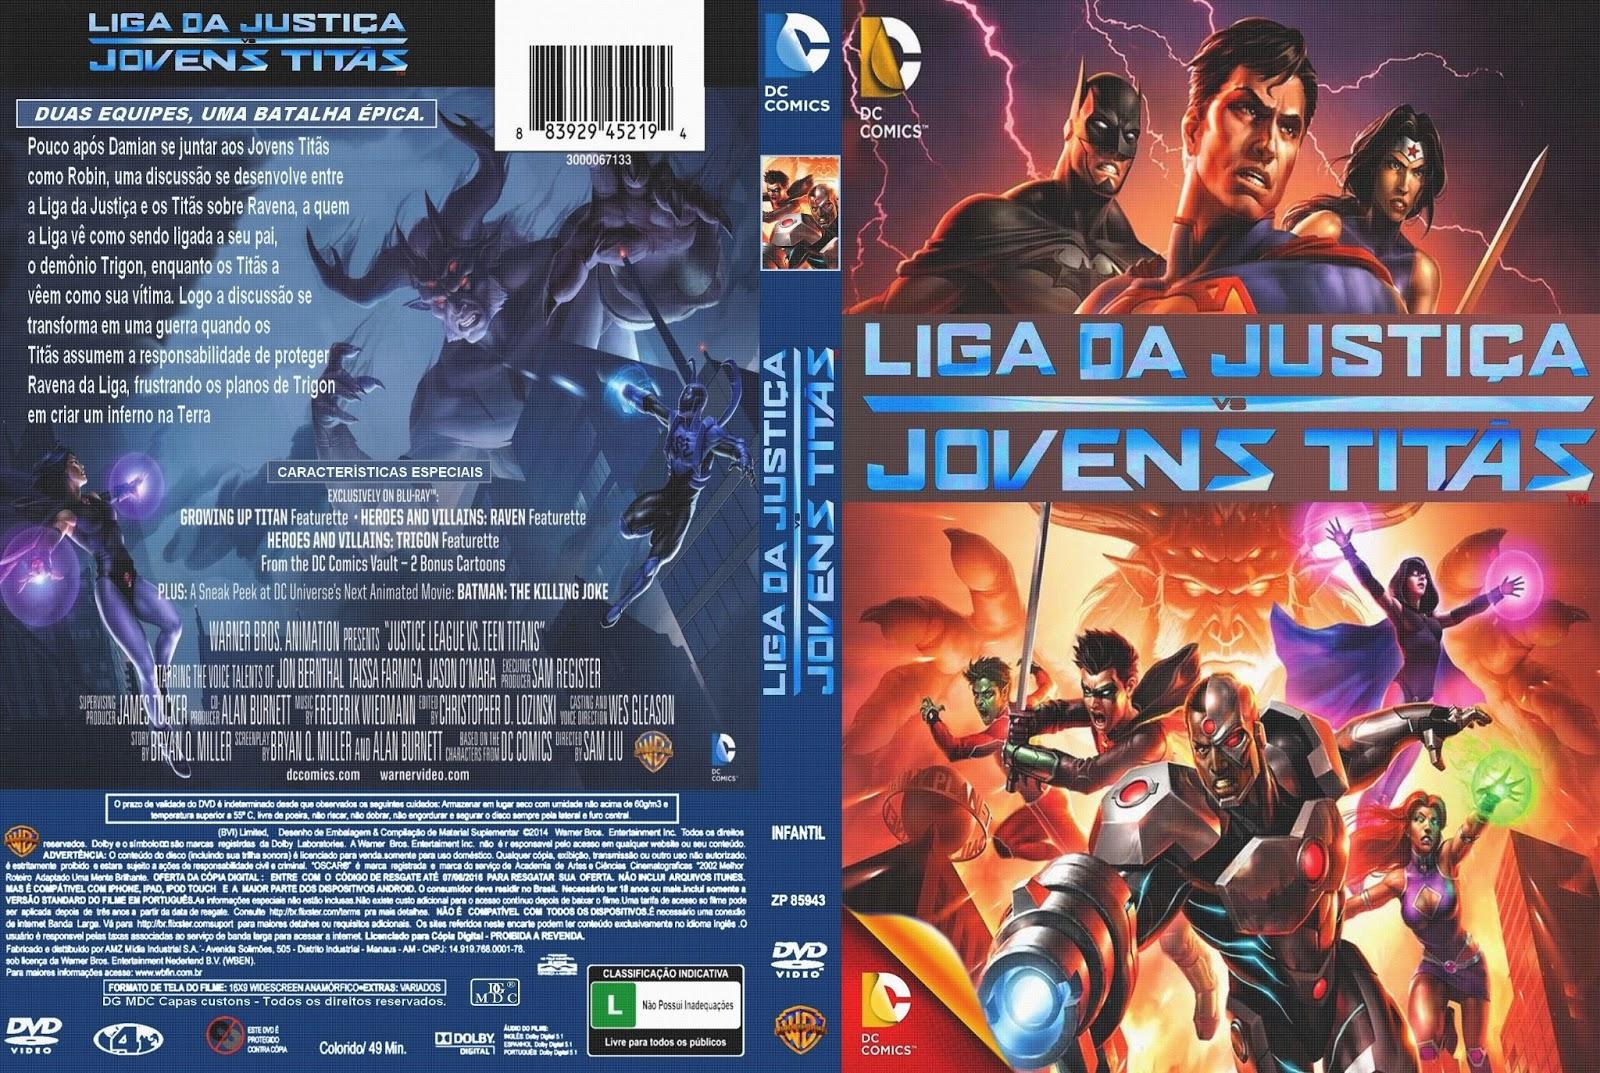 Liga da Justiça vs Jovens Titãs DVD-R Liga 2Bda 2BJusti 25C3 25A7a 2Bvs 2BJovens 2BTit 25C3 25A3s 2BDVD R 2BXANDAO 2BDOWNLOAD